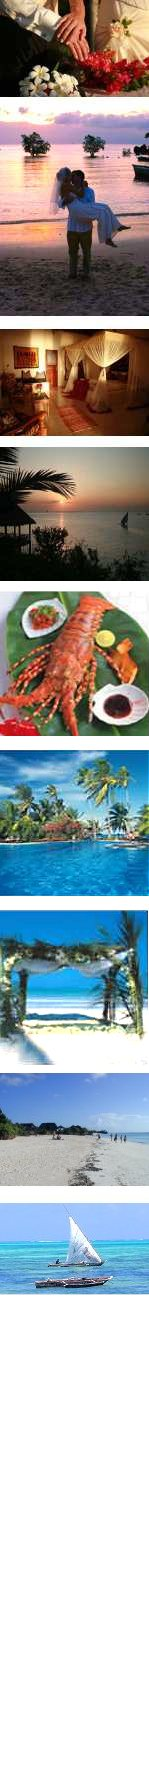 Romantic Getaway & Classic Weddings - Zanzibar